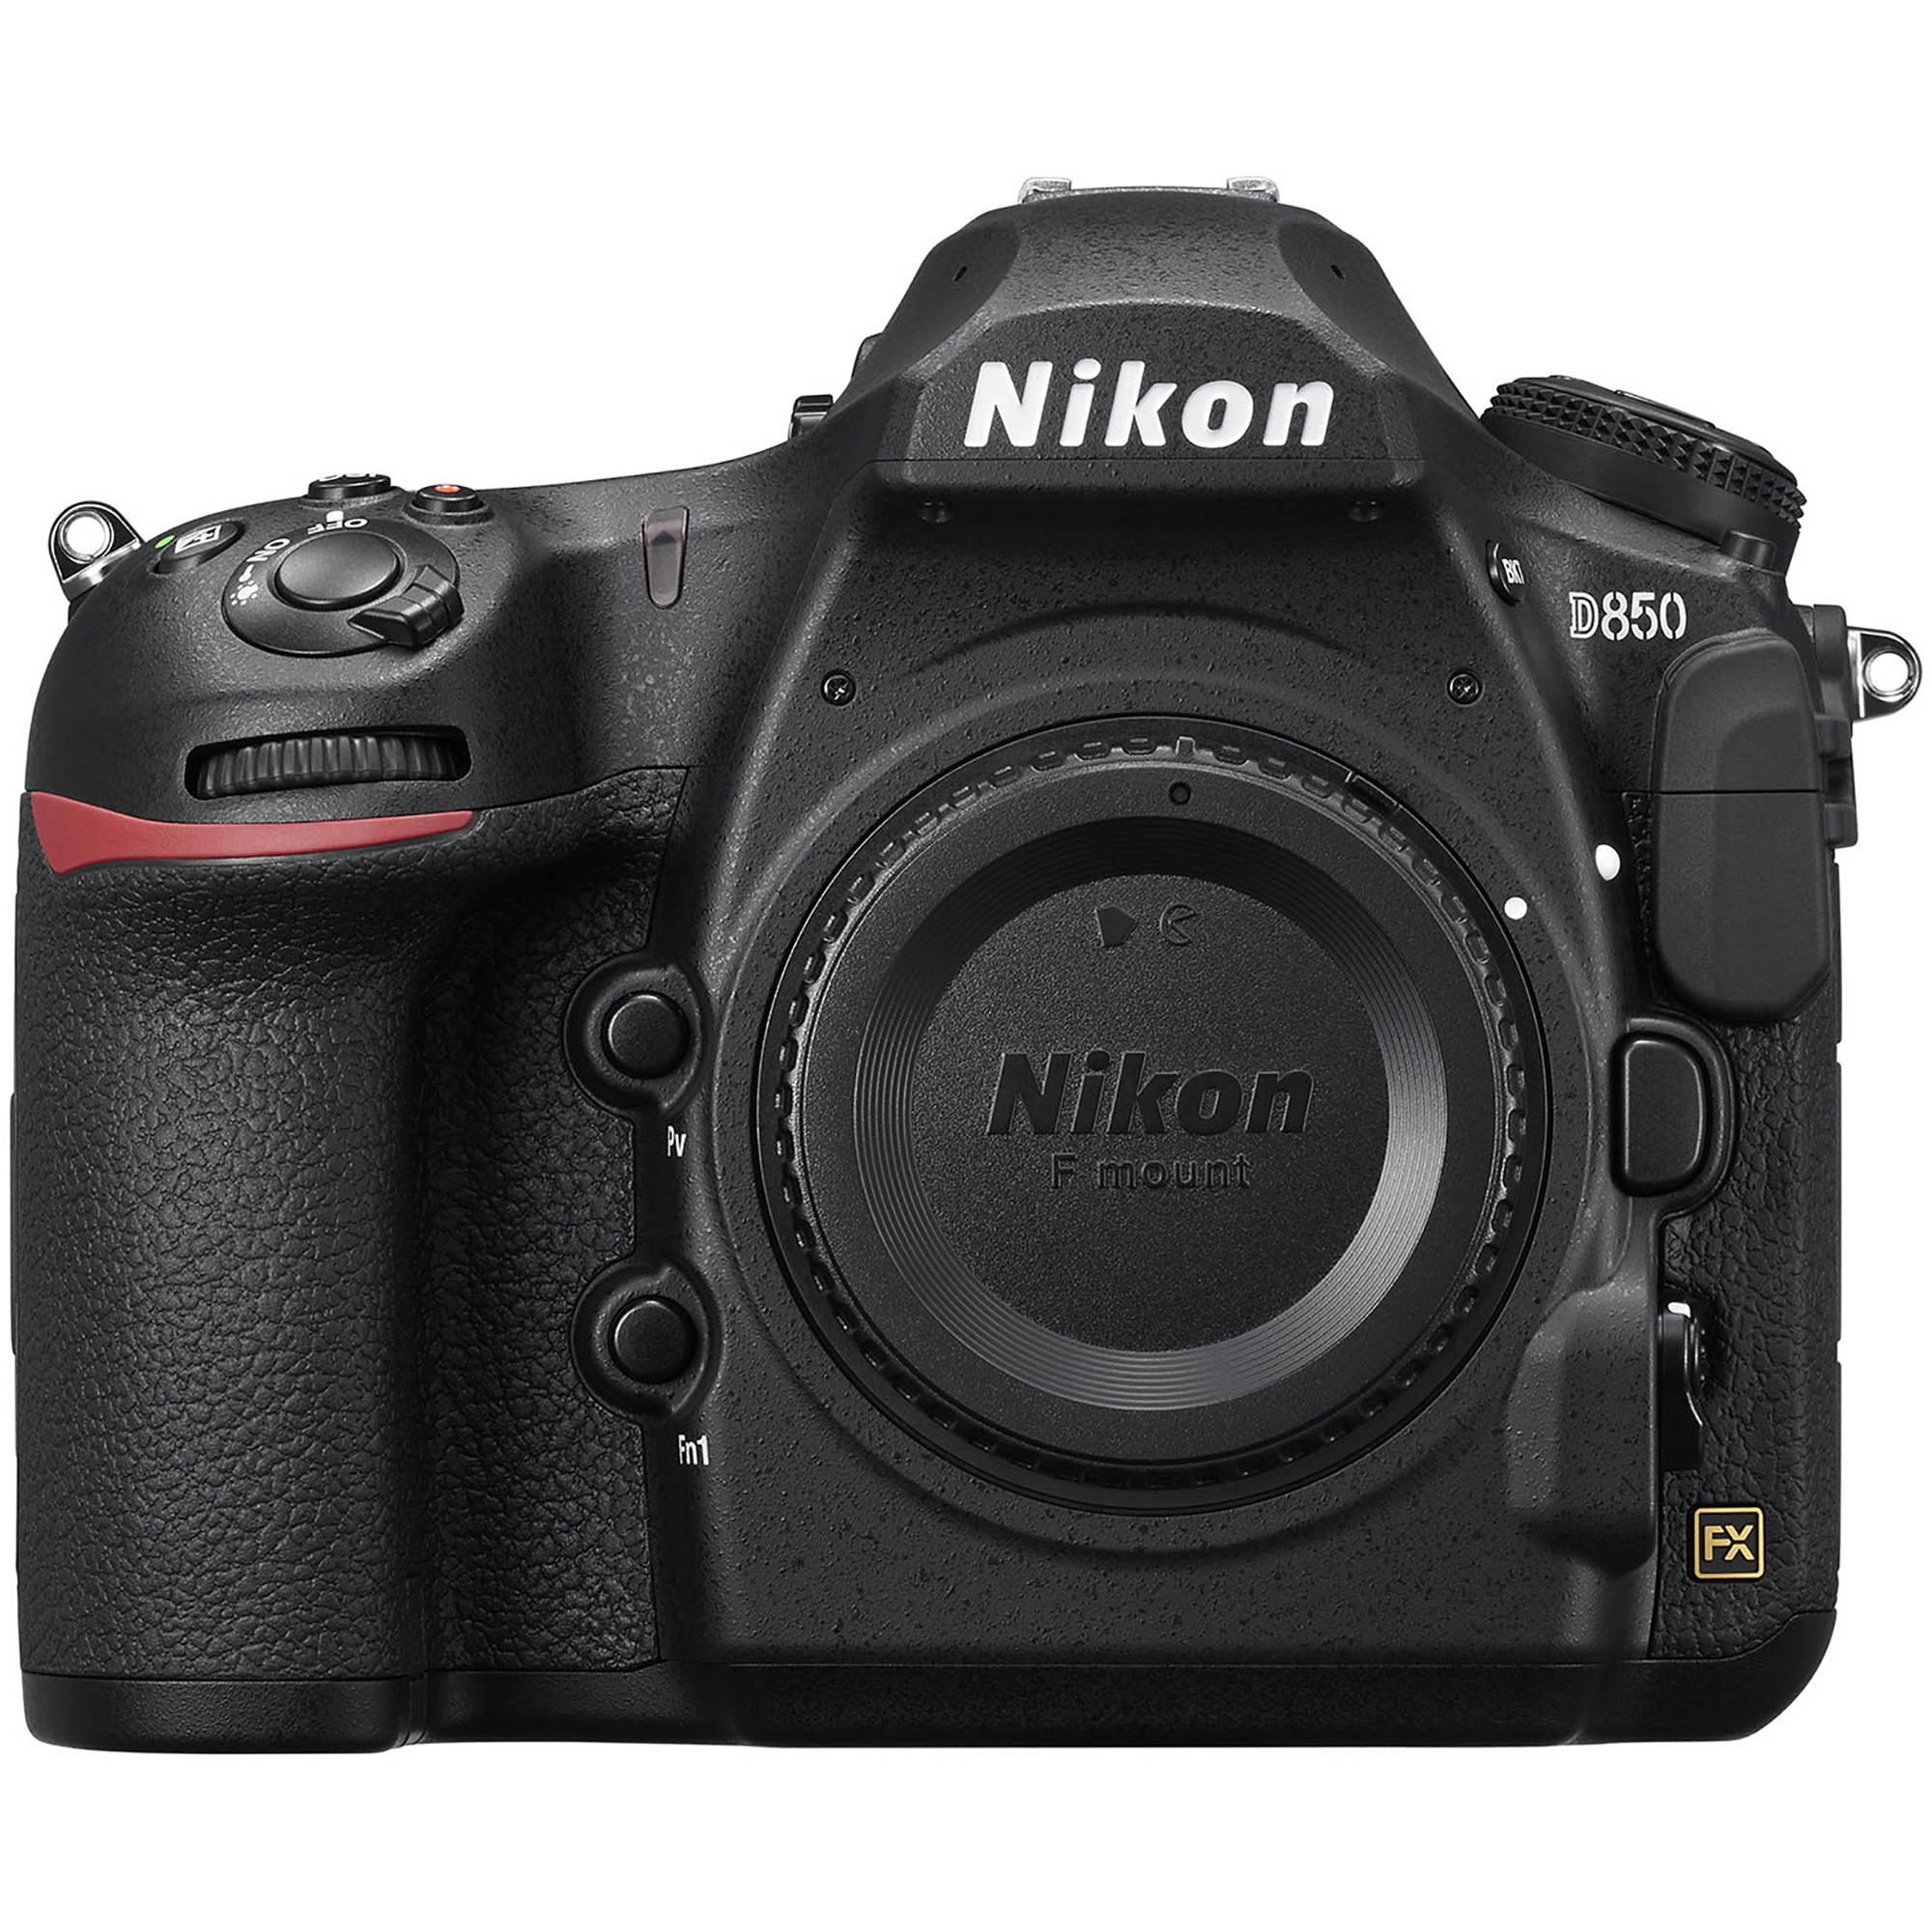 nikon_d850_dslr_camera_body_1351688.jpg